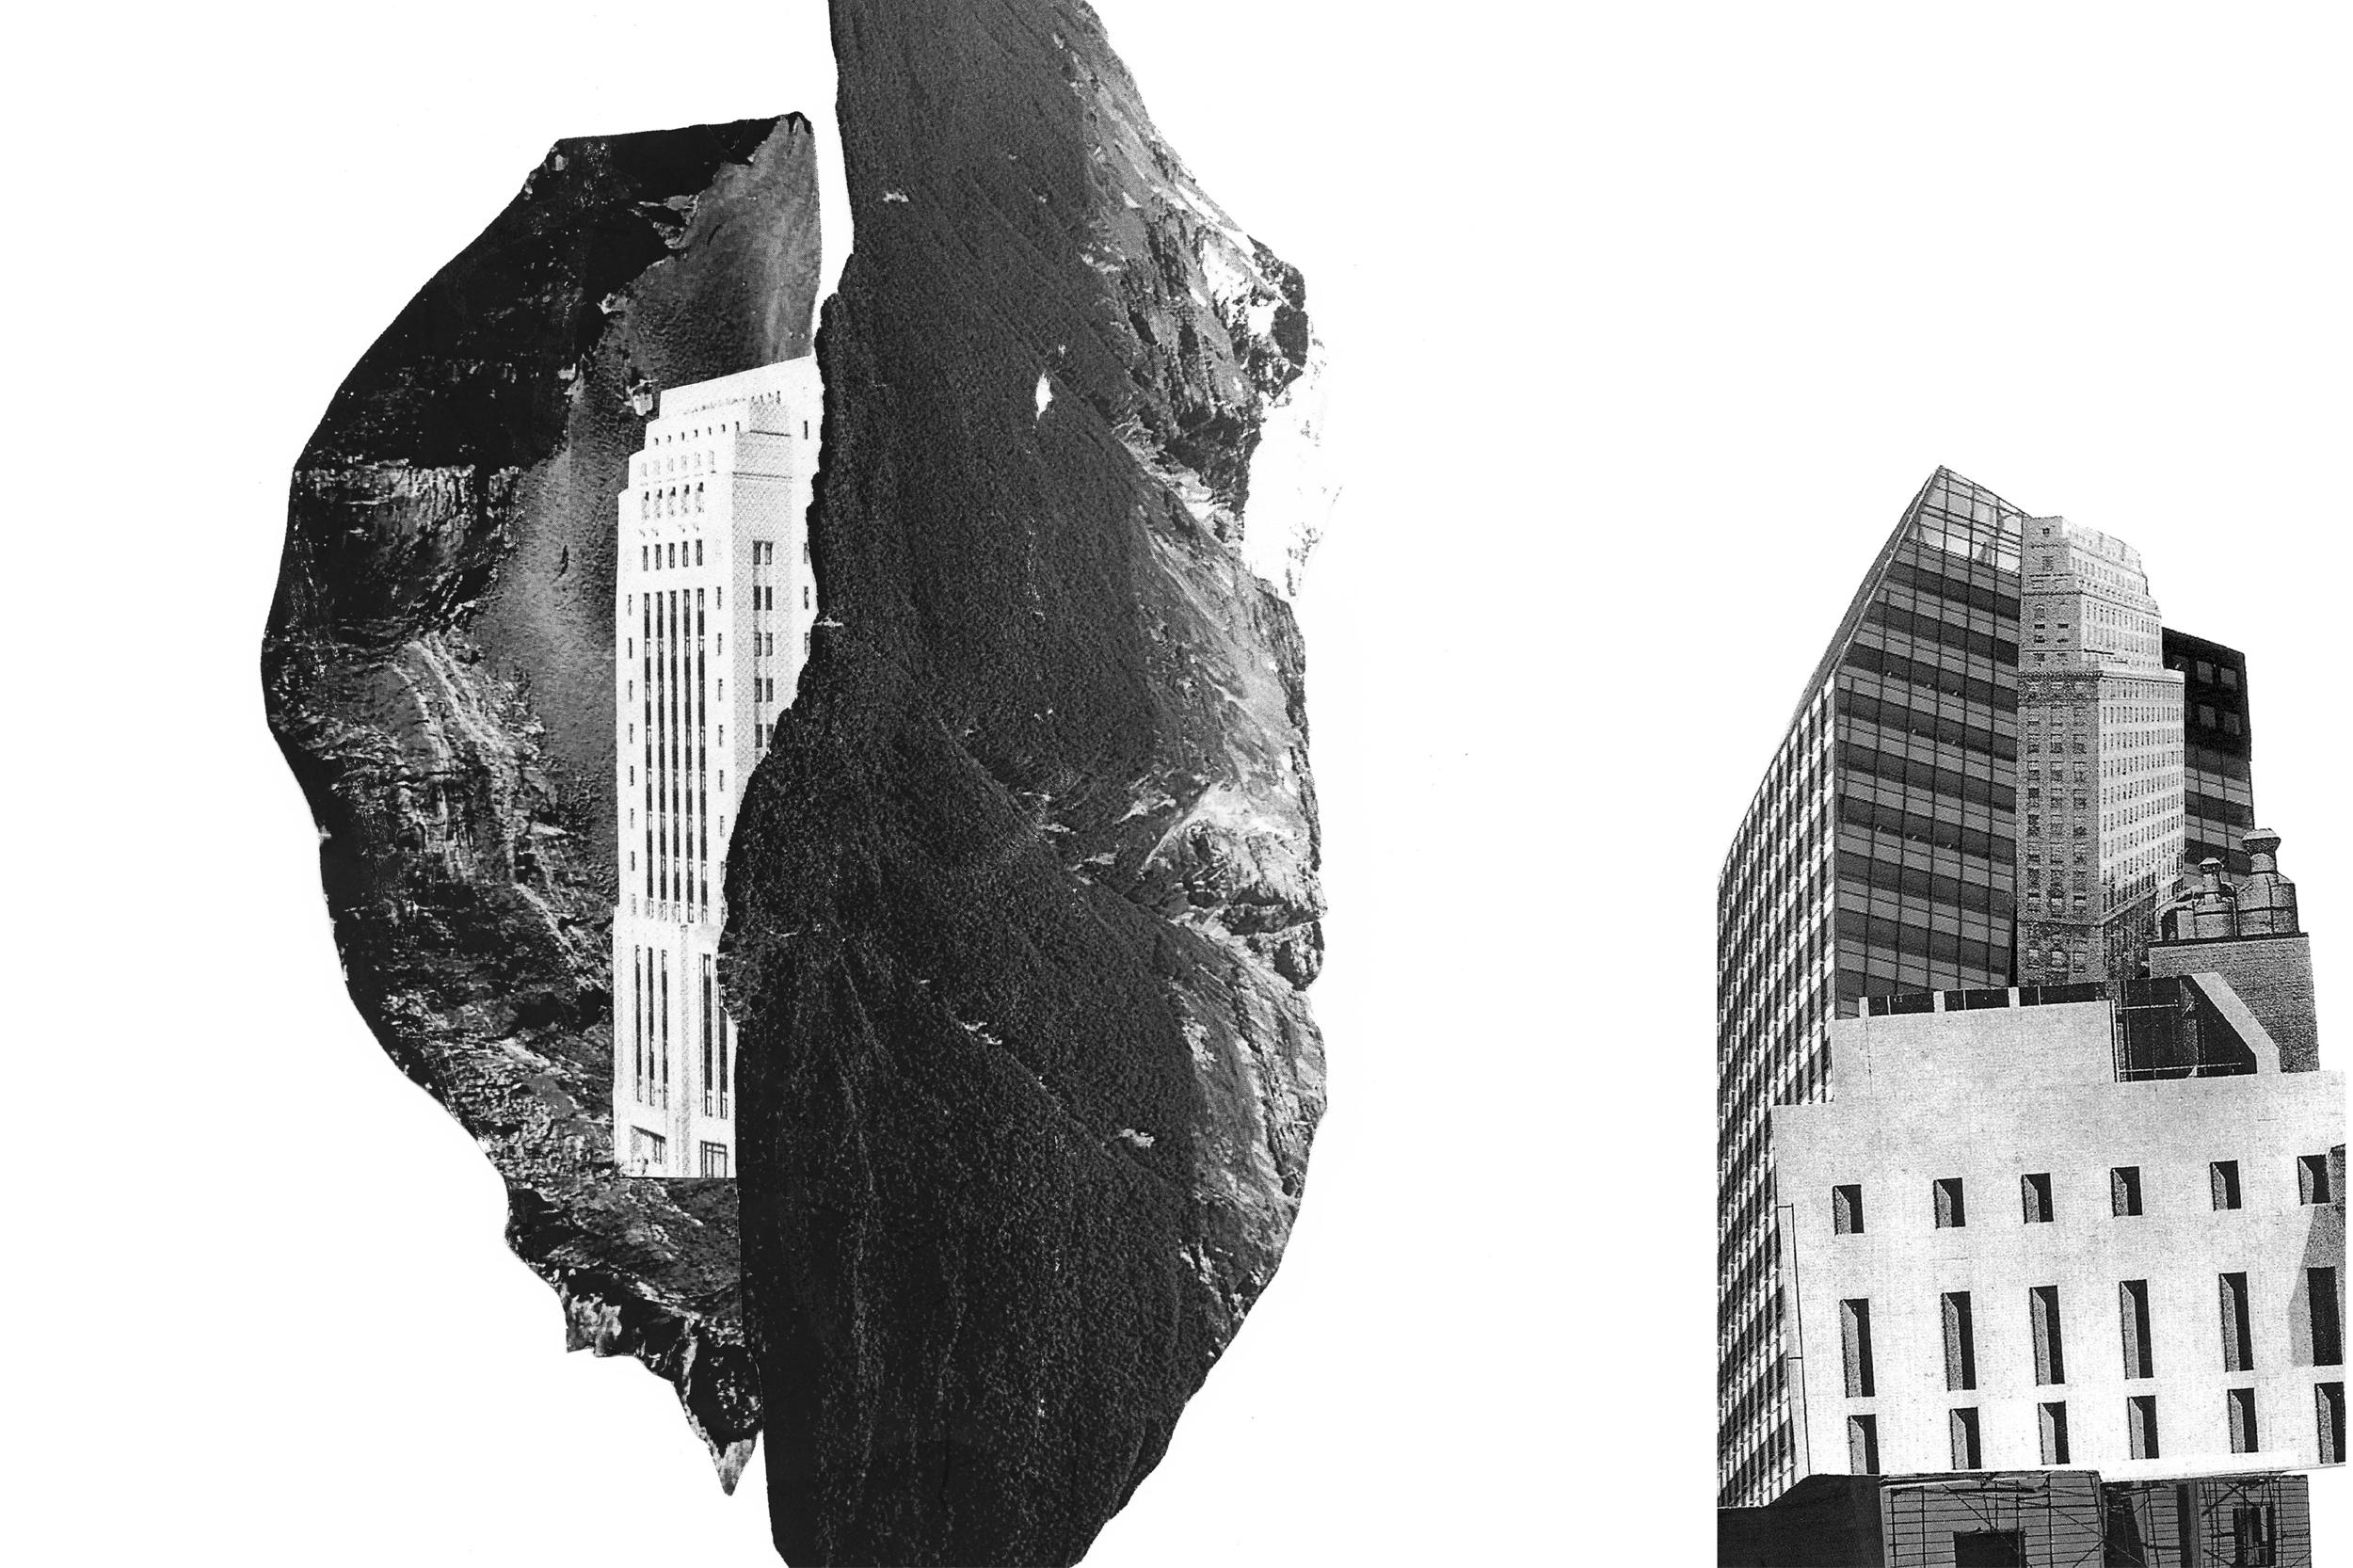 FARADAY_collage_bricks-between-stones.jpg